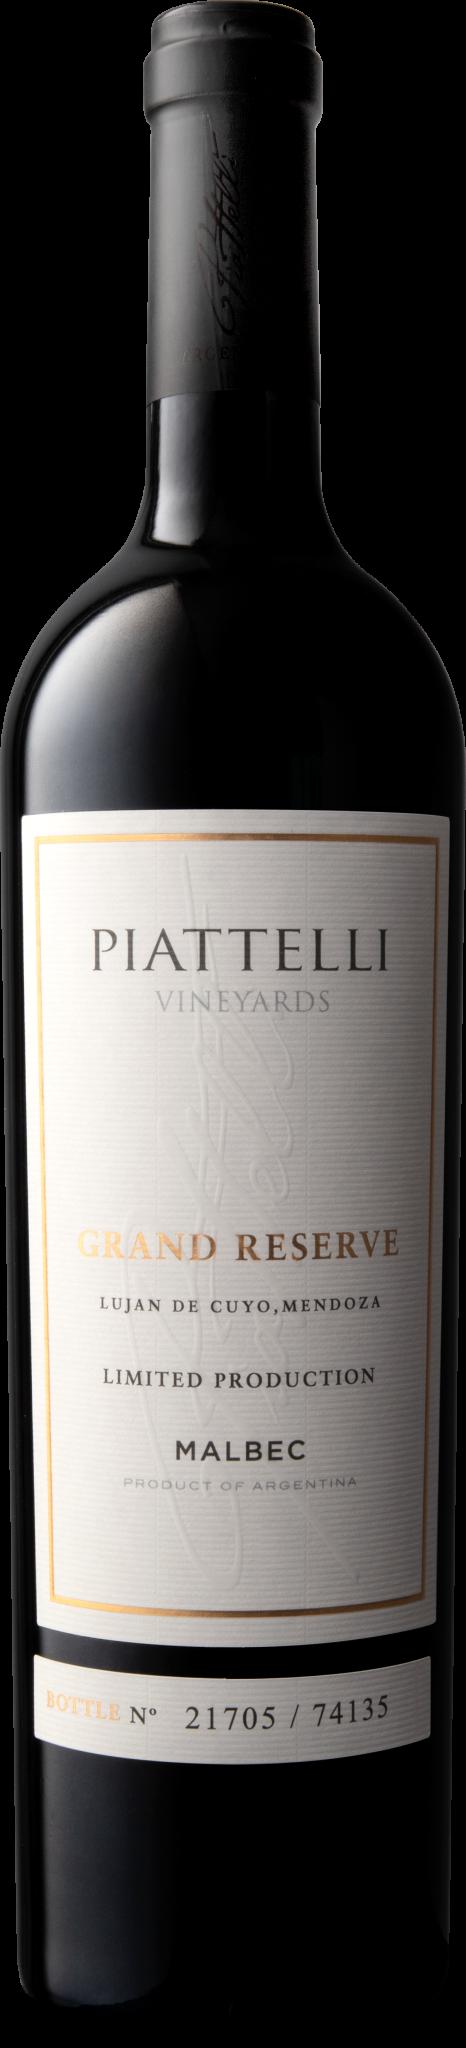 PIATTELLI GRAND RESERVE MALBEC 750ML